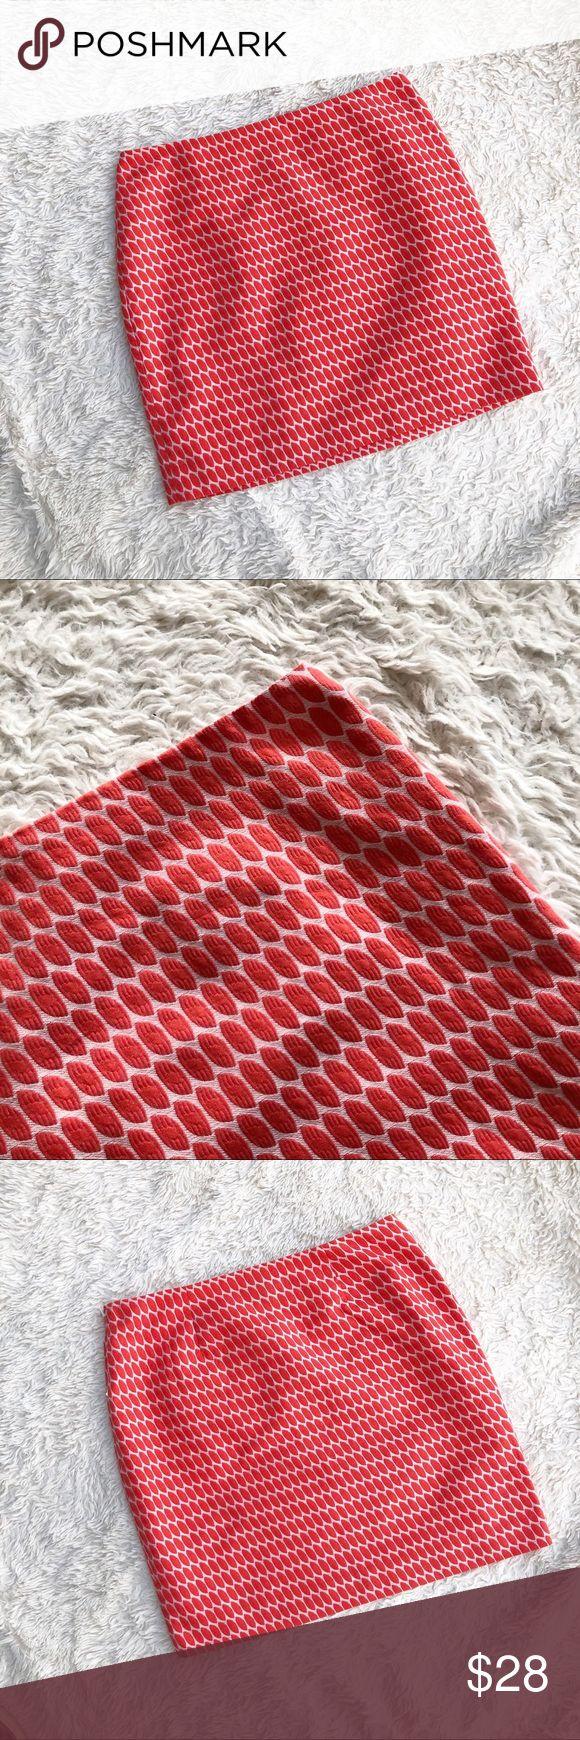 "ANN TAYLOR ✨NWT✨ Salmon Geometric Skirt Salmon geometric printed skirt. Fully lined. Waist (flat): 16"", Hips: 20.5"", Length: 18.25"". ✨OFFERS WELCOME✨ Ann Taylor Skirts"